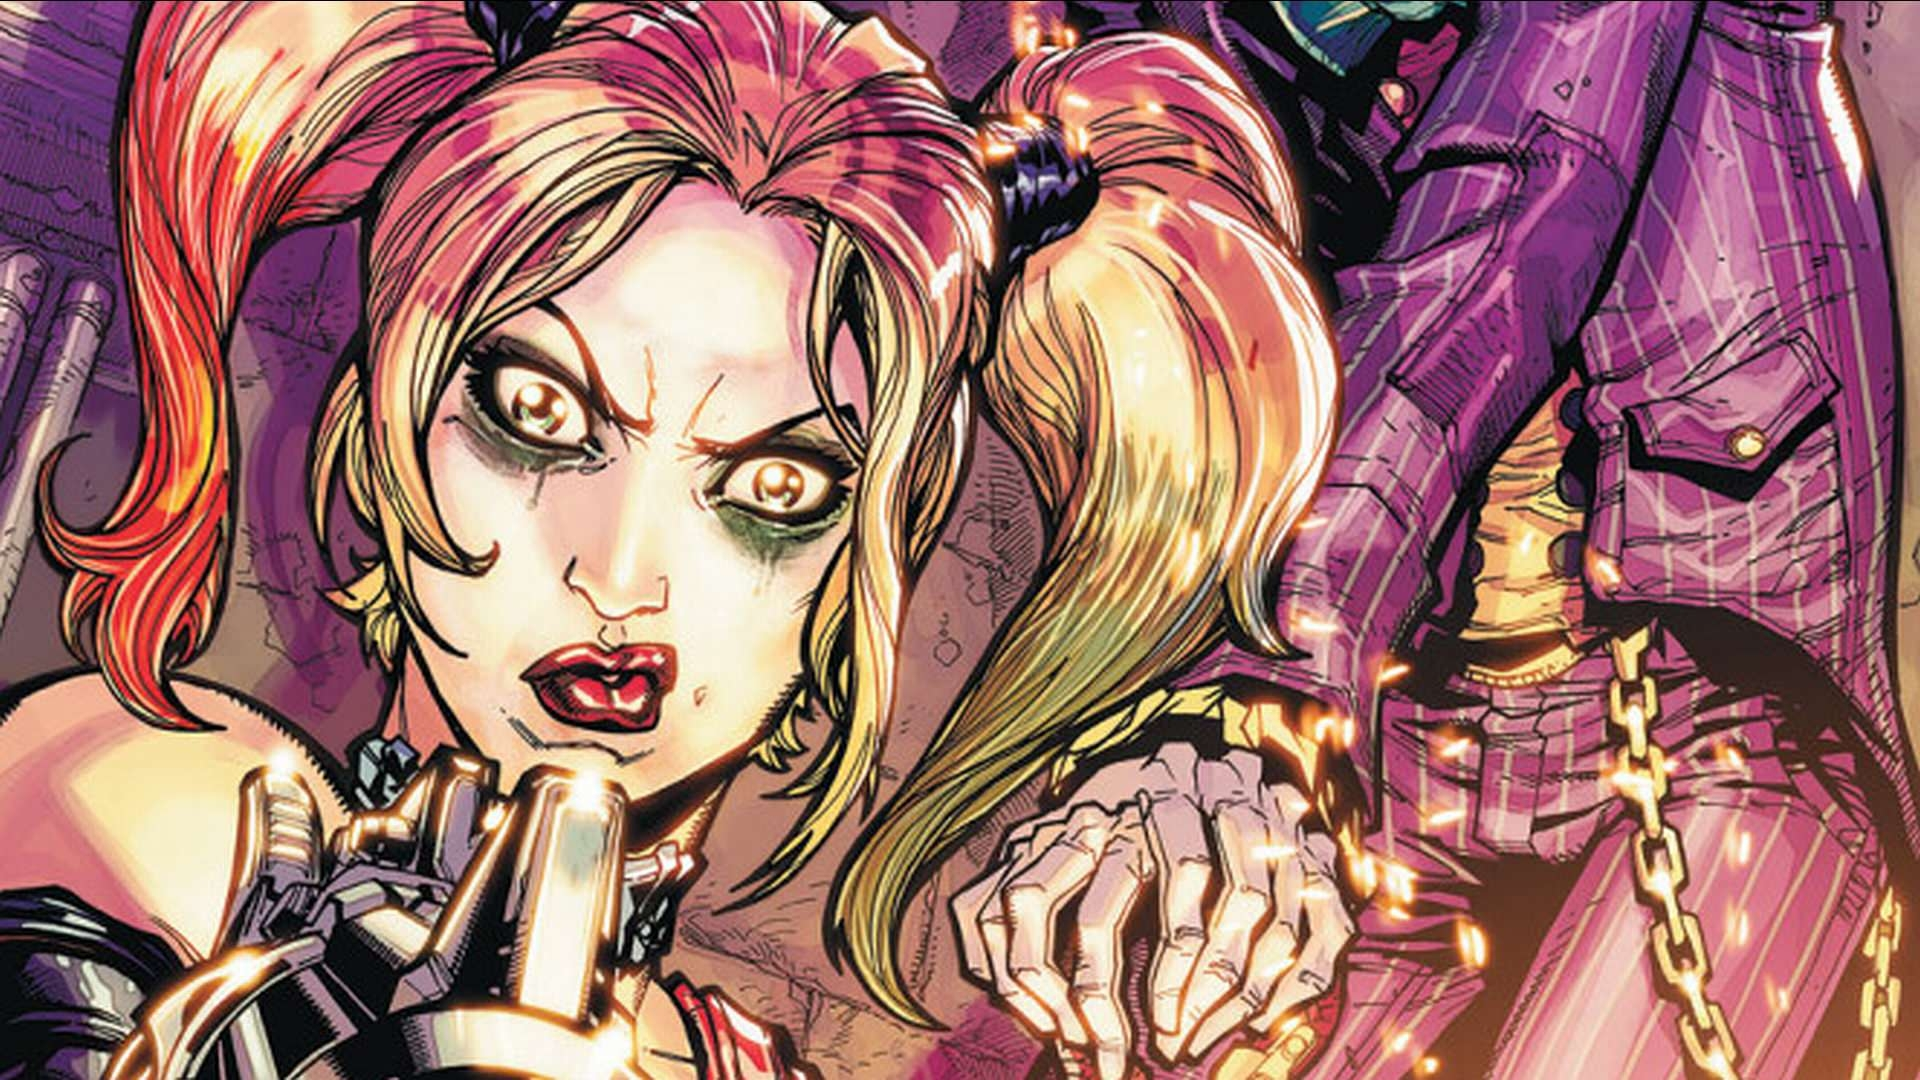 Angry Harley Quinn Wallpaper